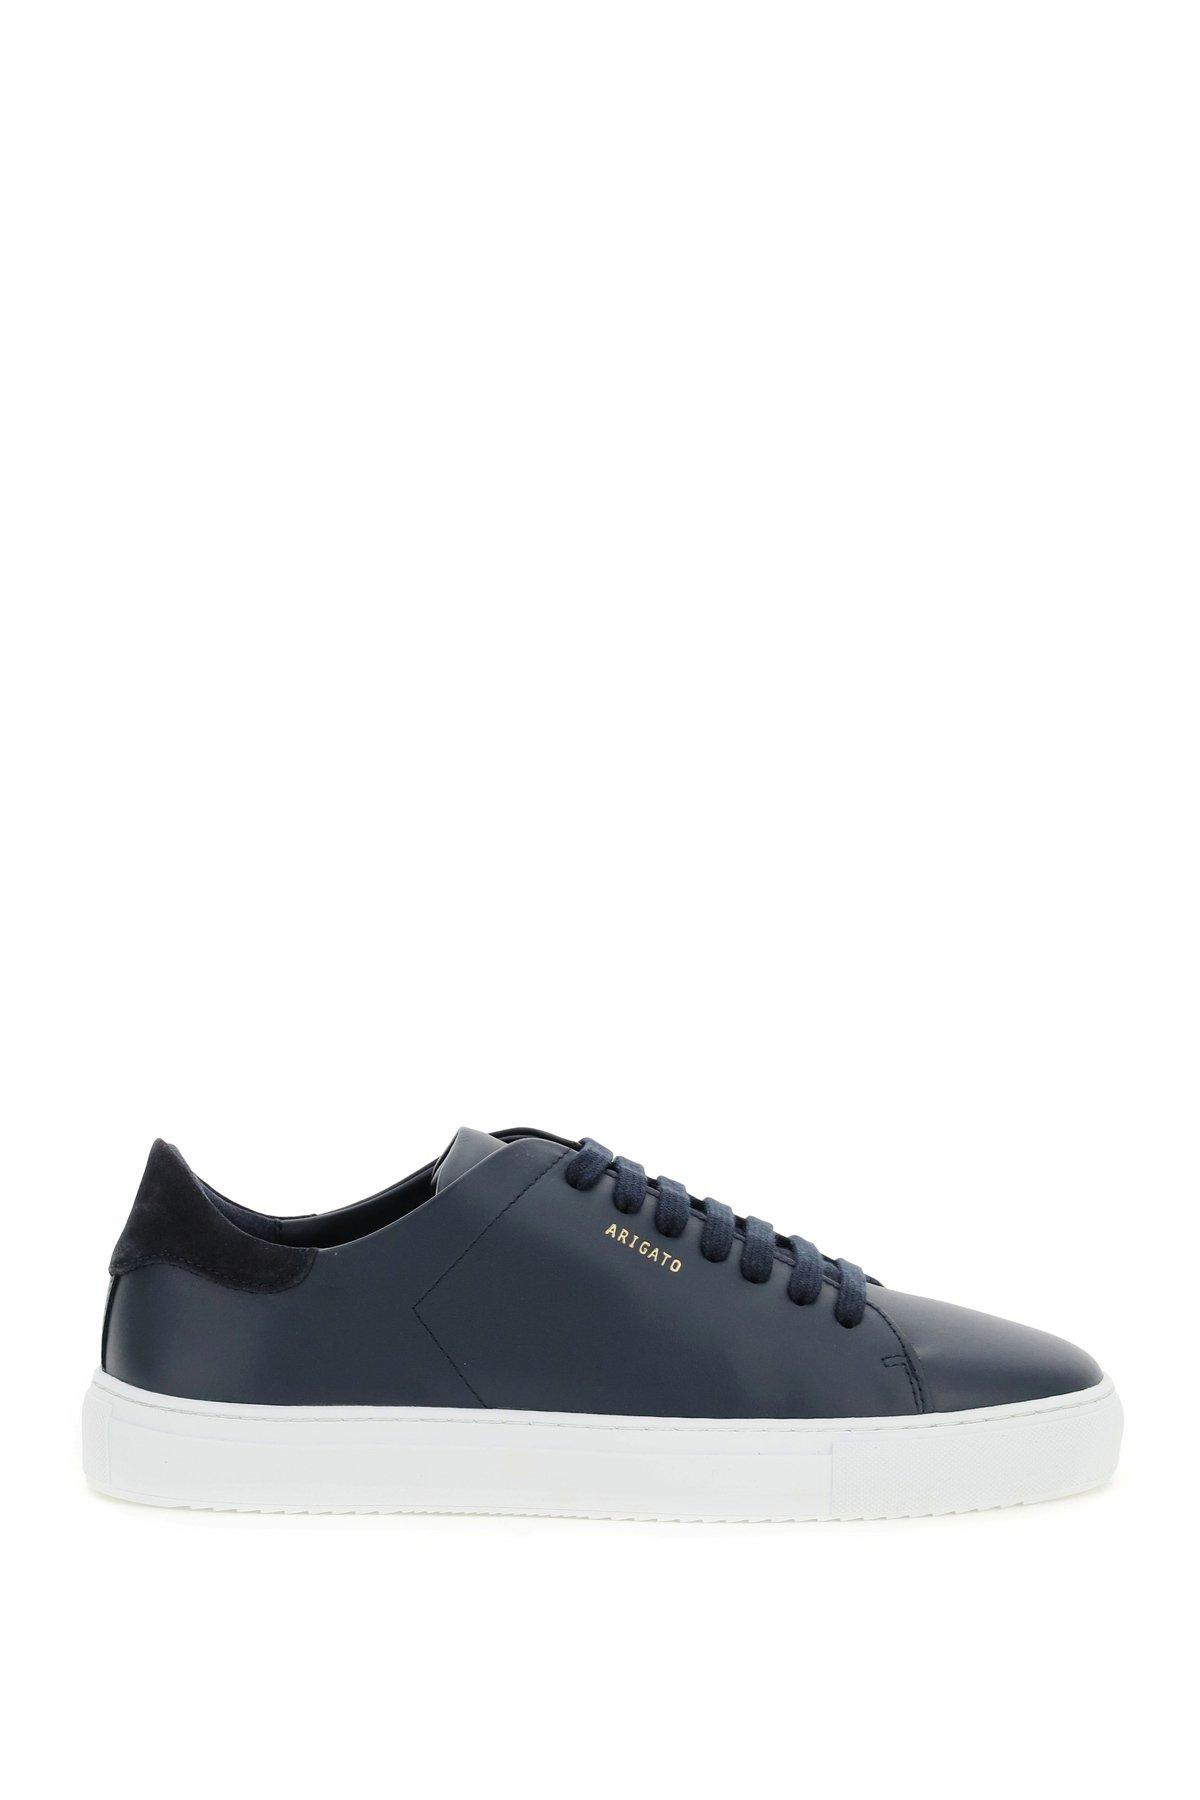 Axel arigato sneakers in pelle clean 90 contrast